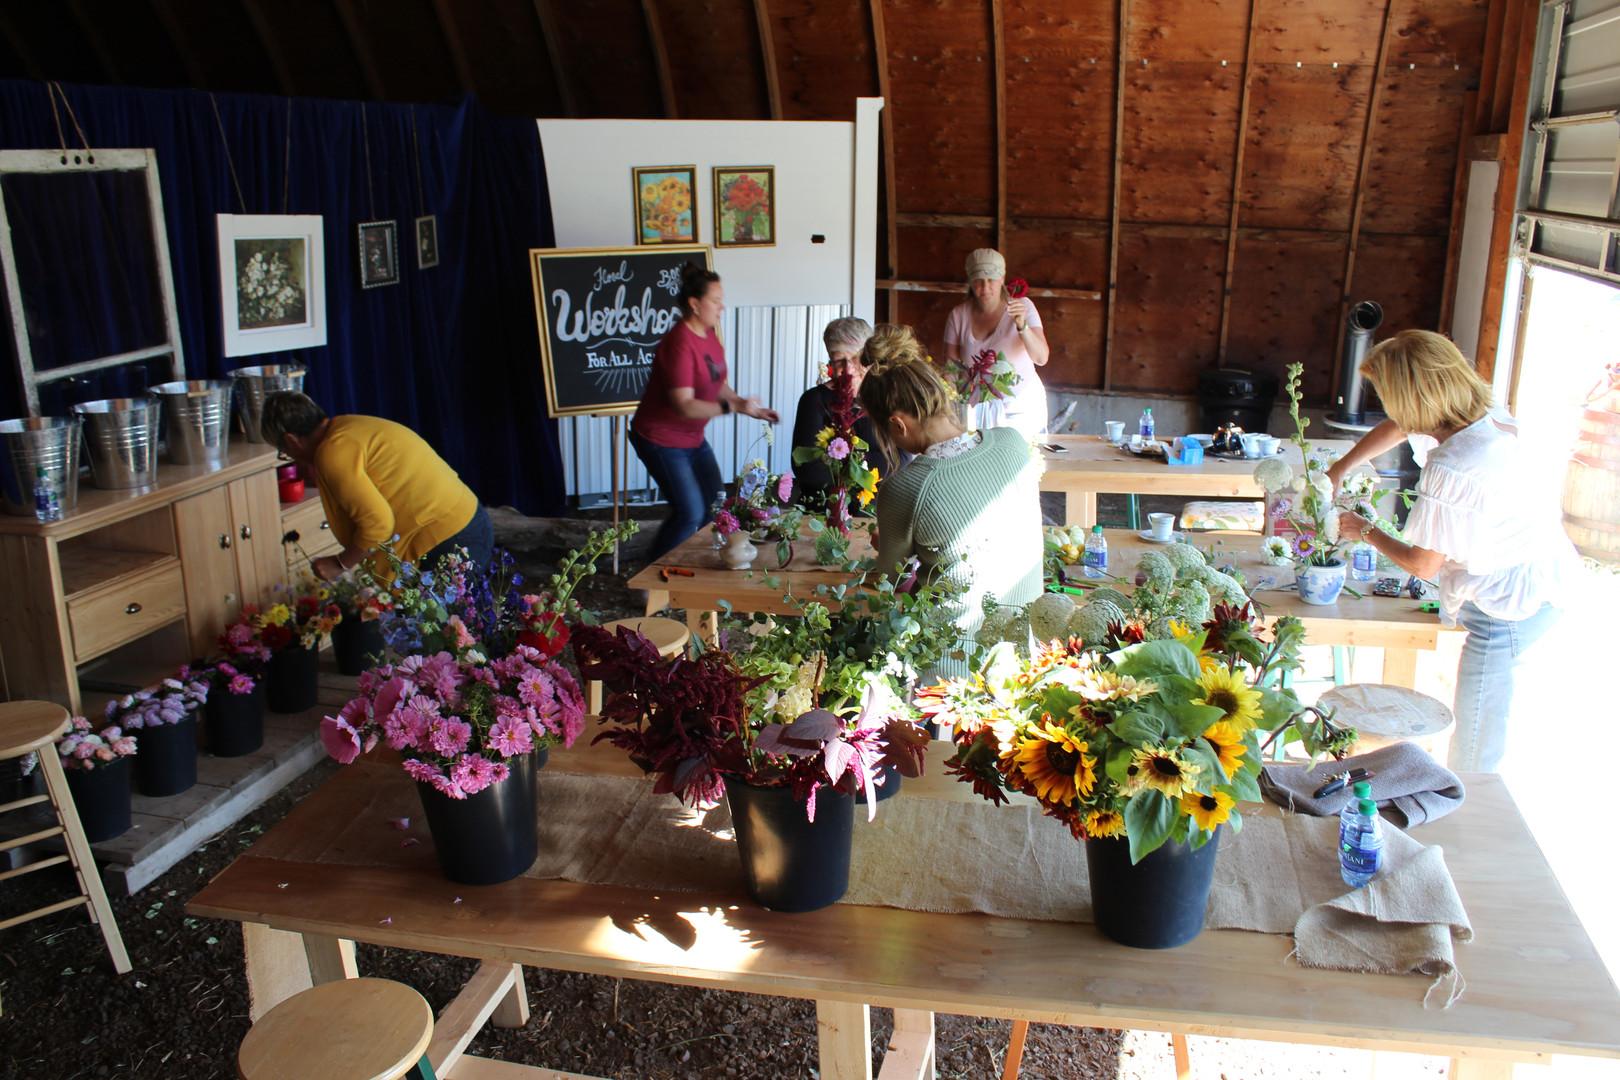 Workshop at Alberta Girl Acres